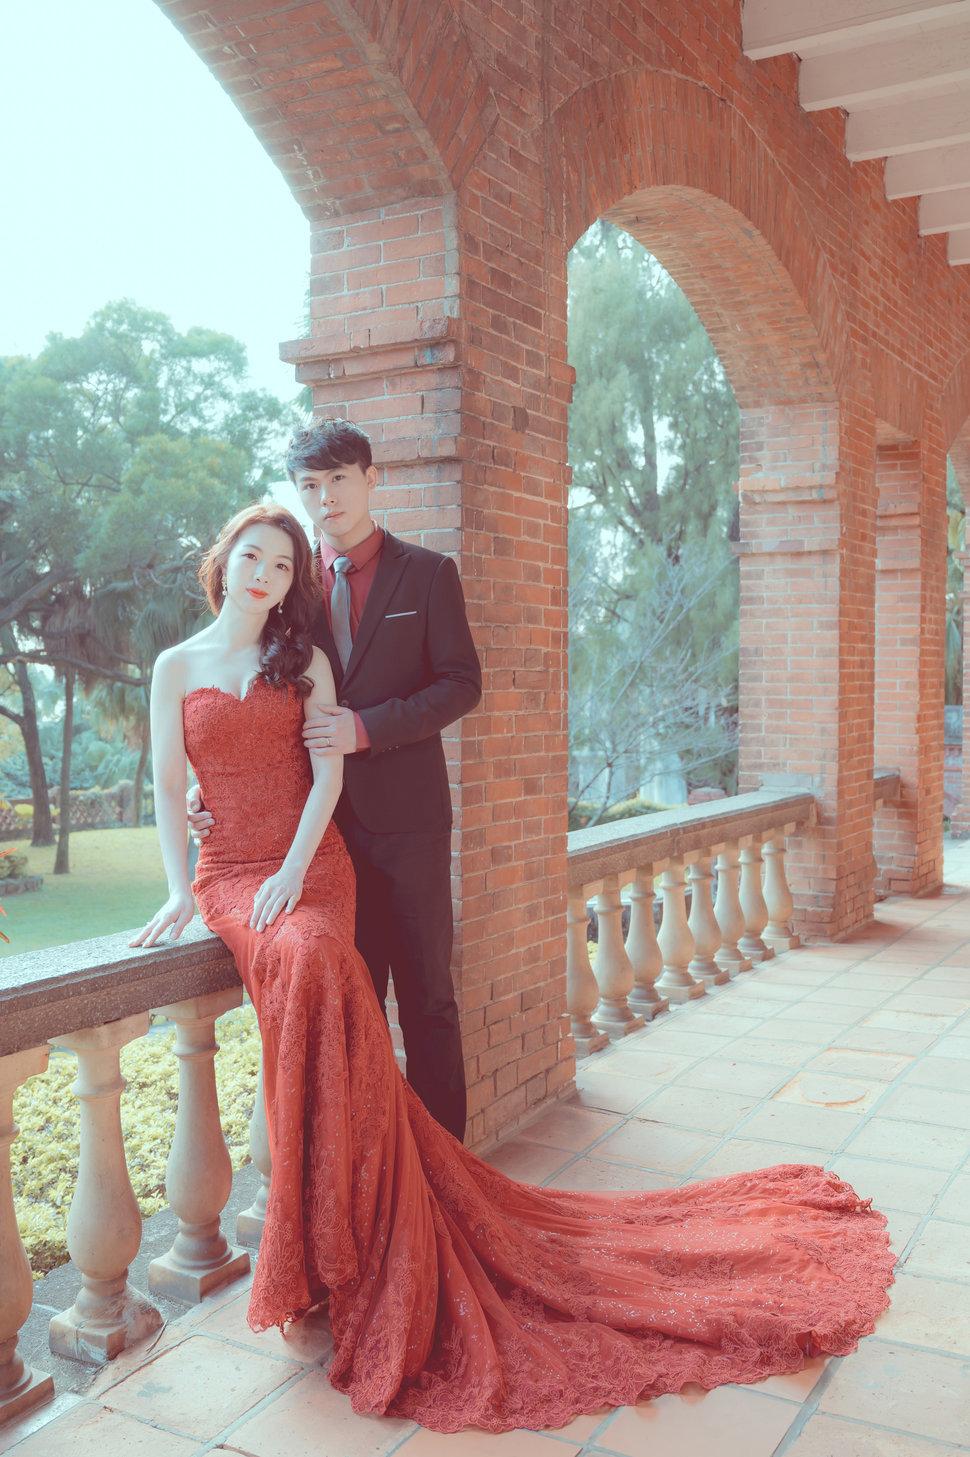 20200111-YEU_5598-1 - 花蓮婚紗 - Sposa Bella《結婚吧》